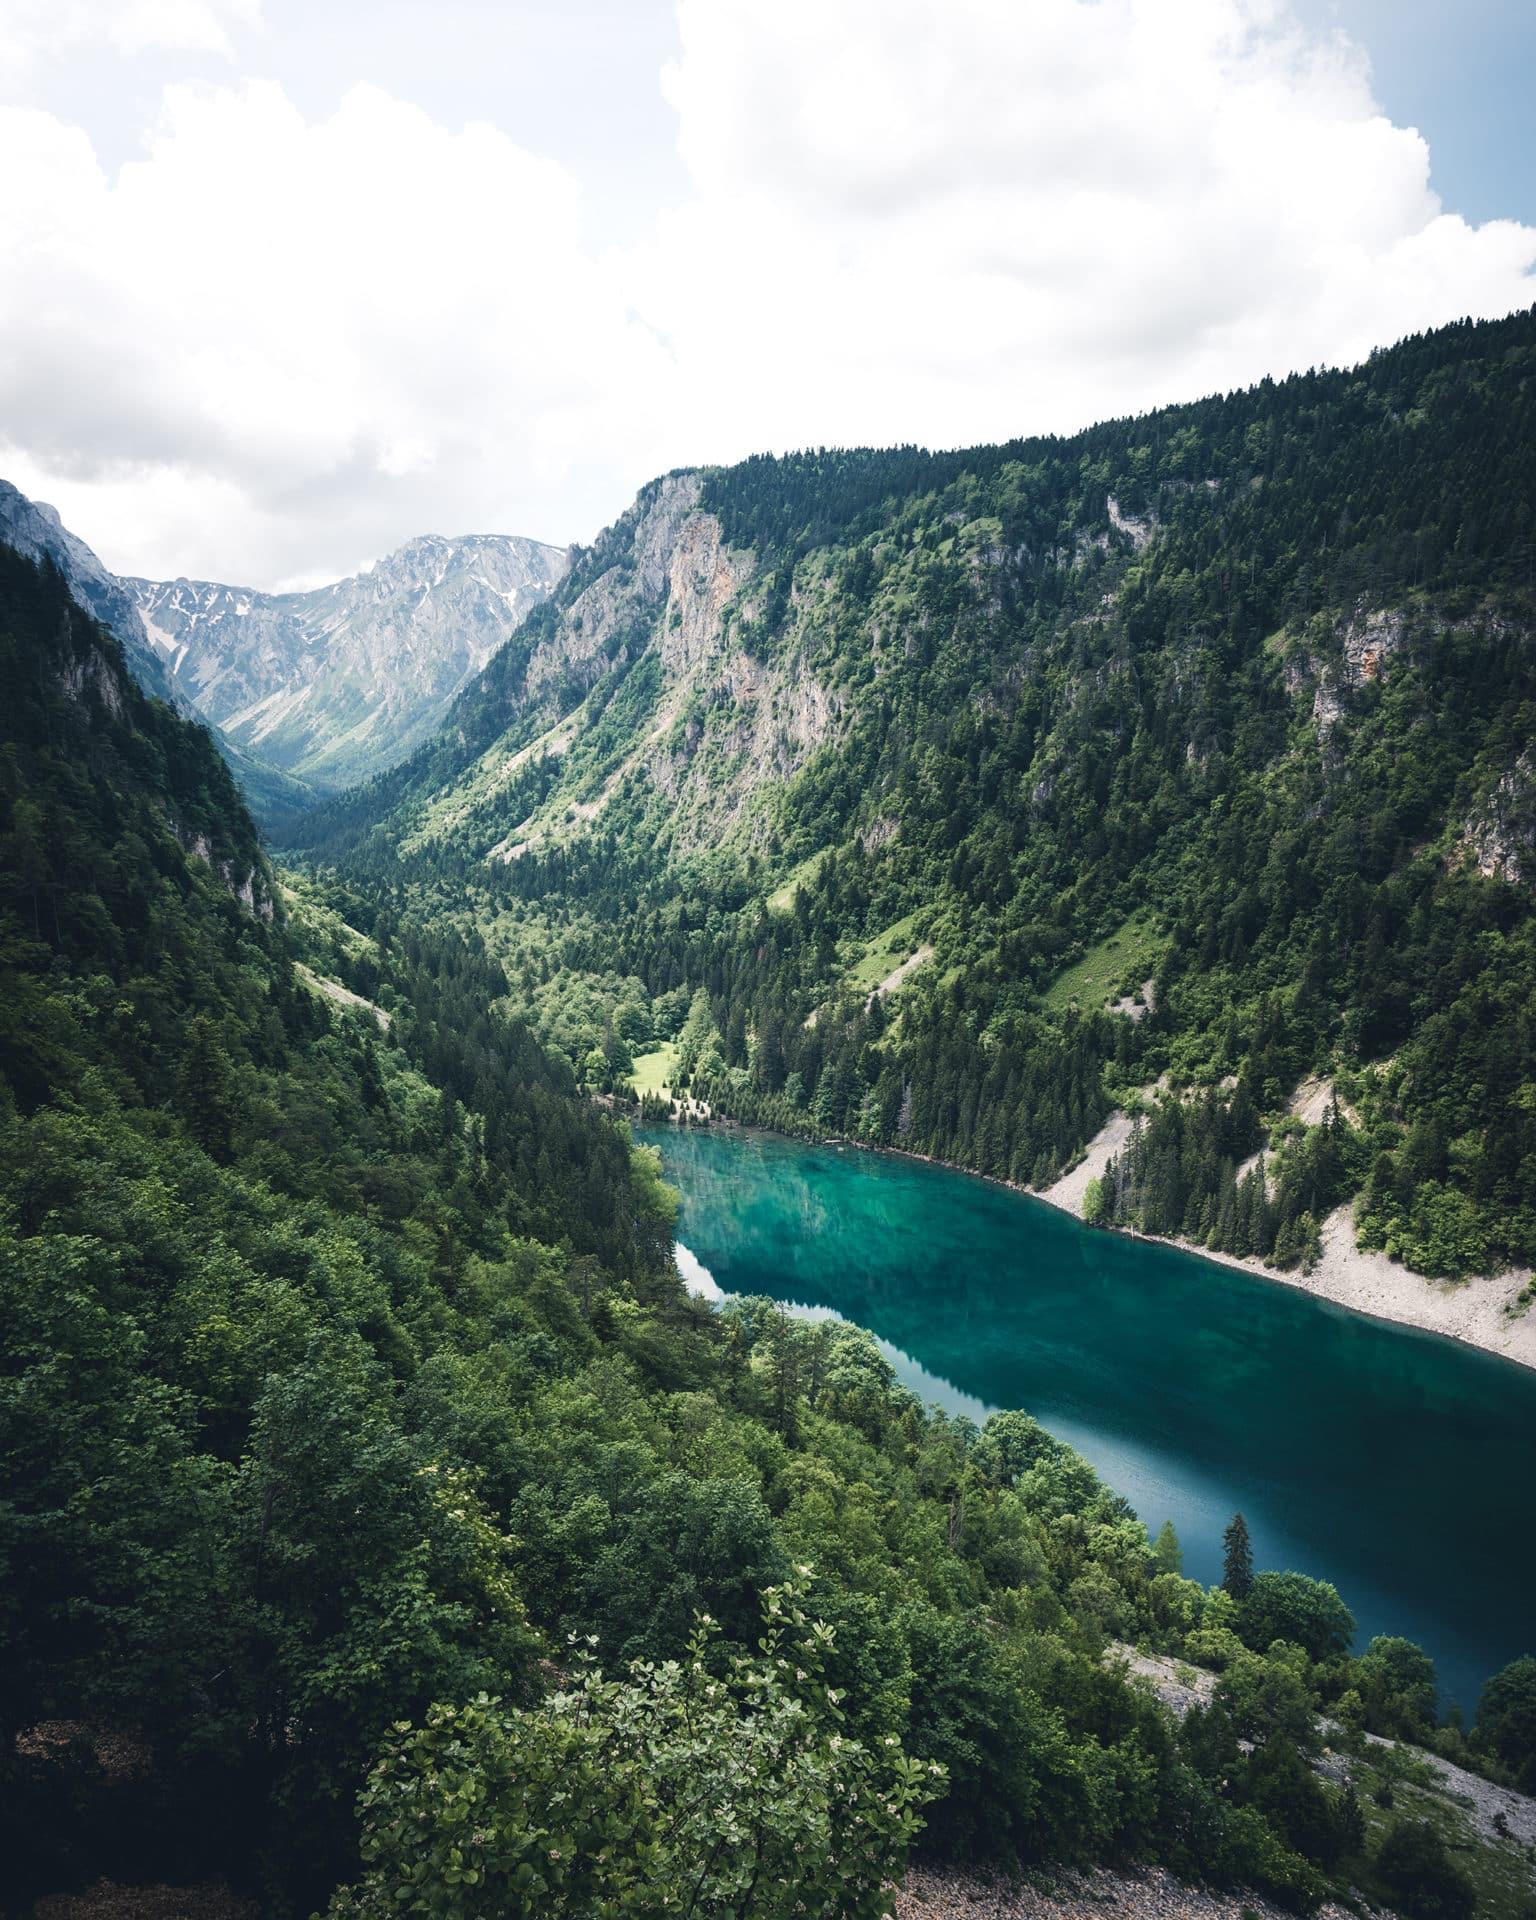 Susicko Jezero Montenegro Durmitor